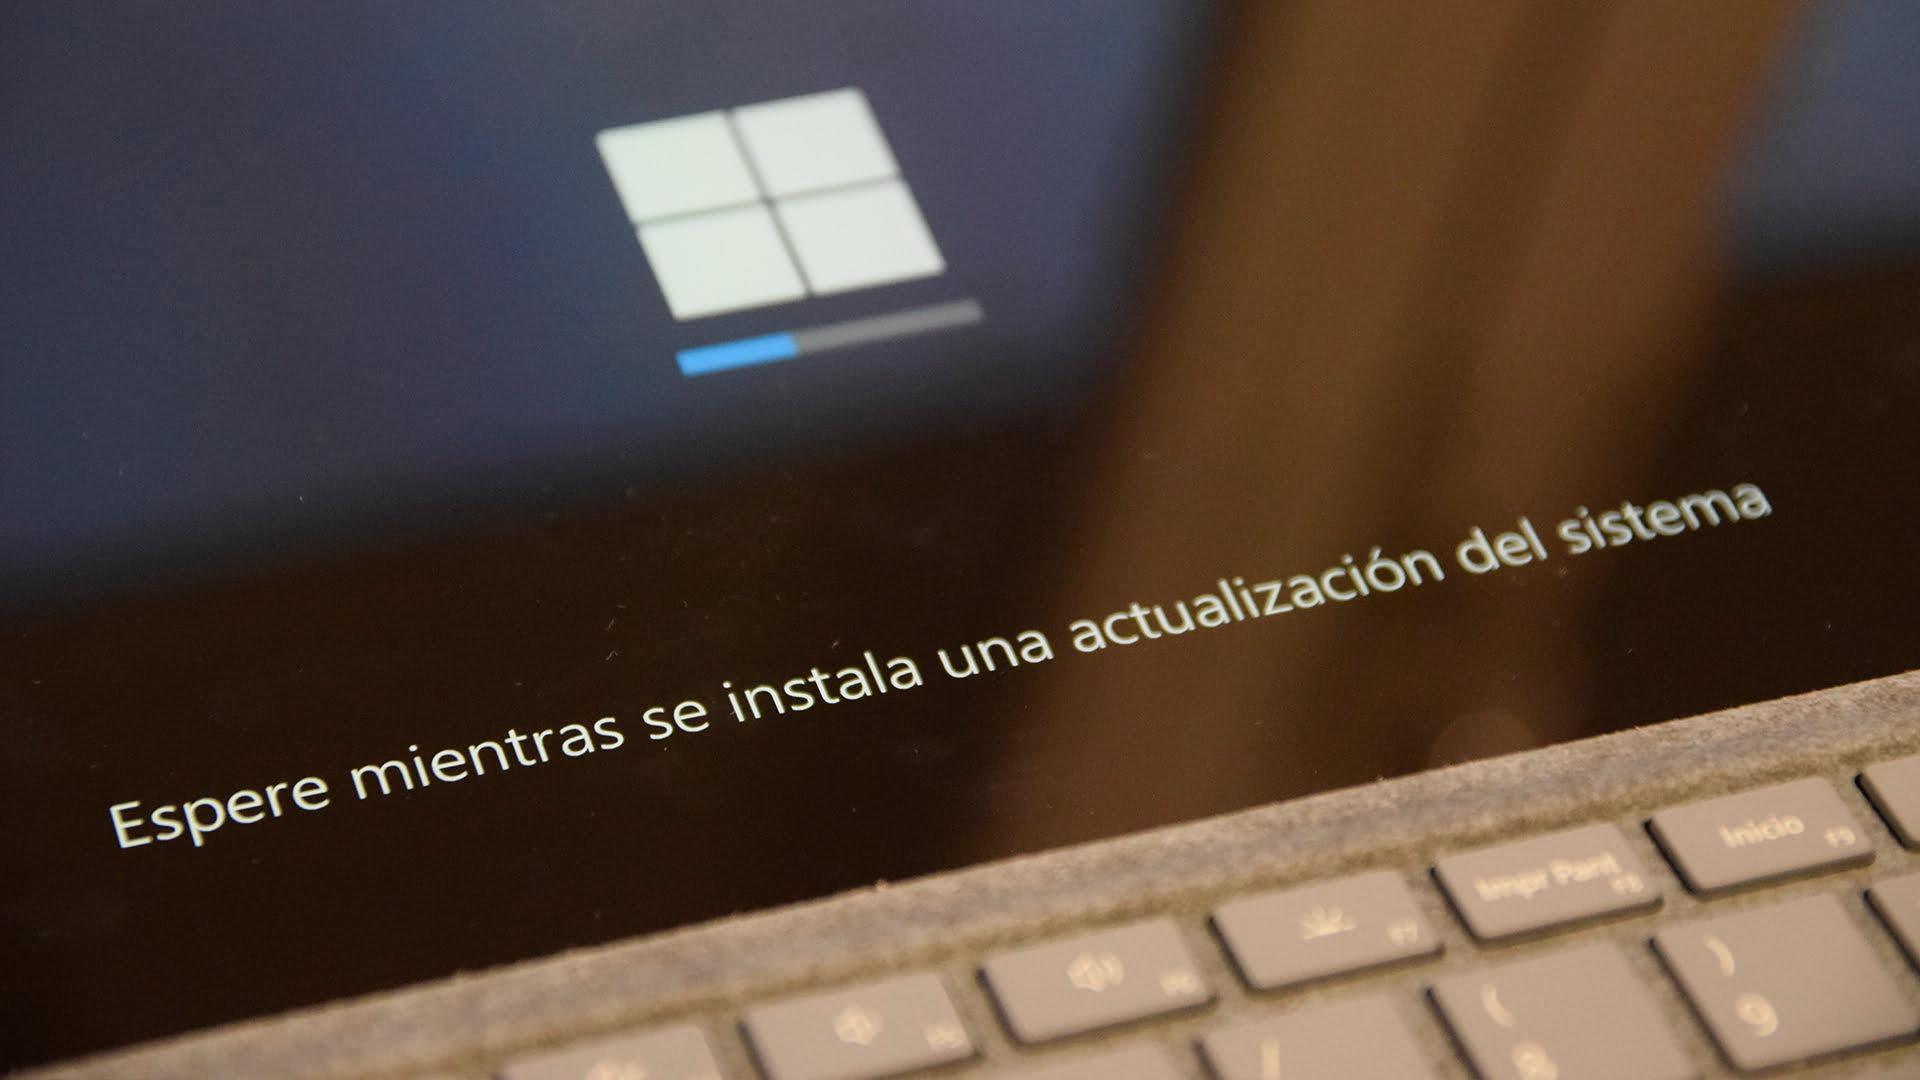 Surface Pro 7 actualizando